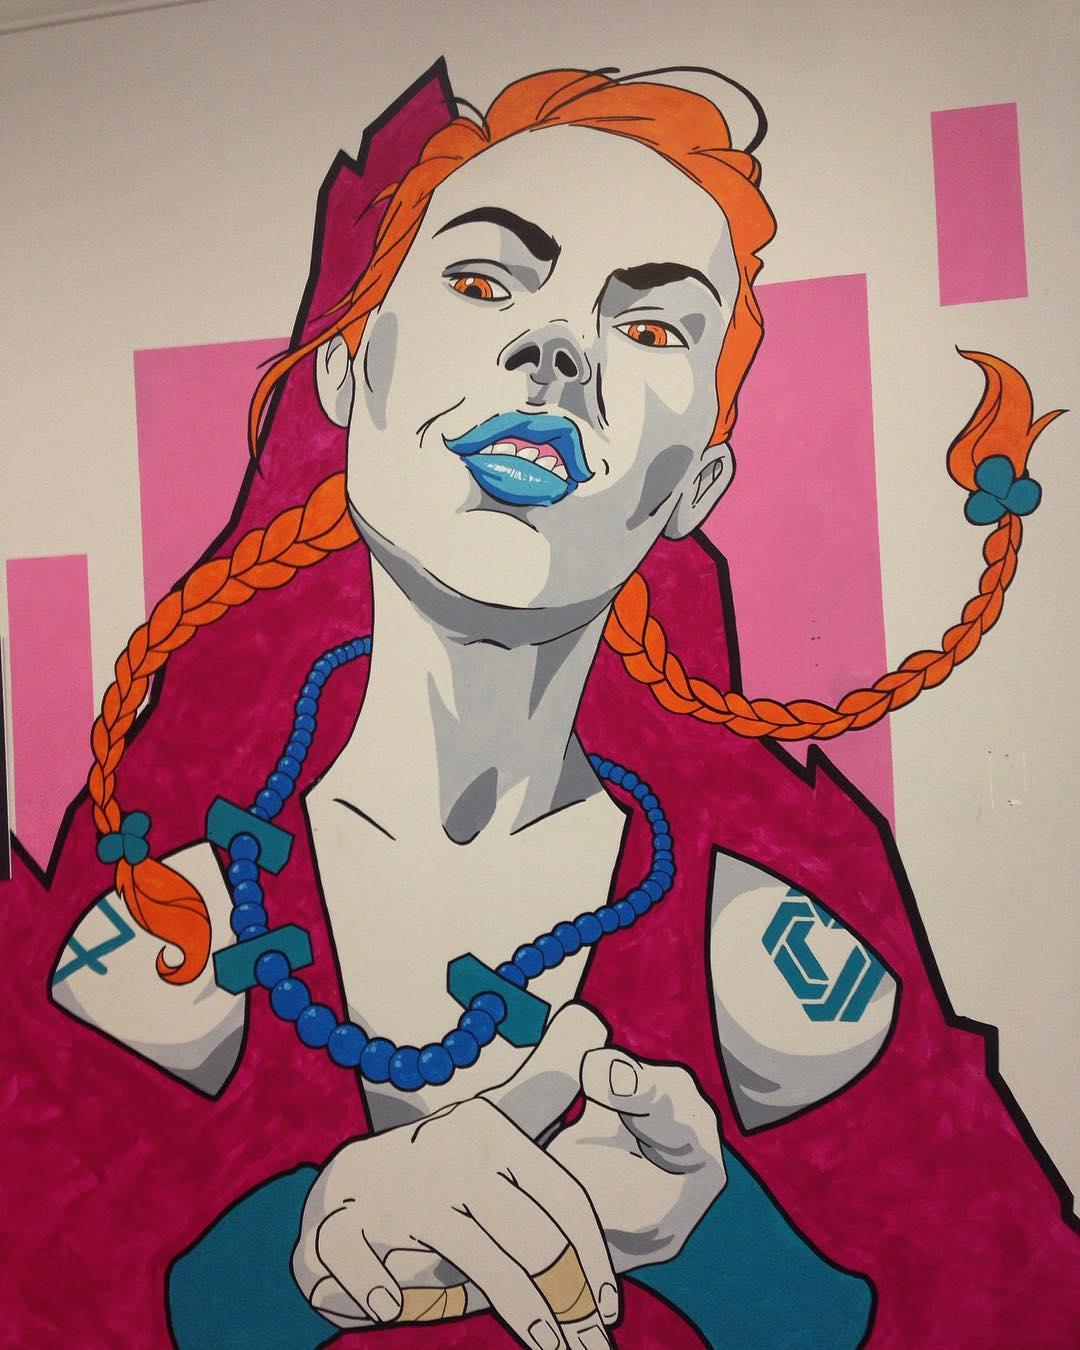 New mural by @jiminai at @cruxcc • #jiminai #cruxclimbingcenter #crux #spratx #art #mural #austintx #atx